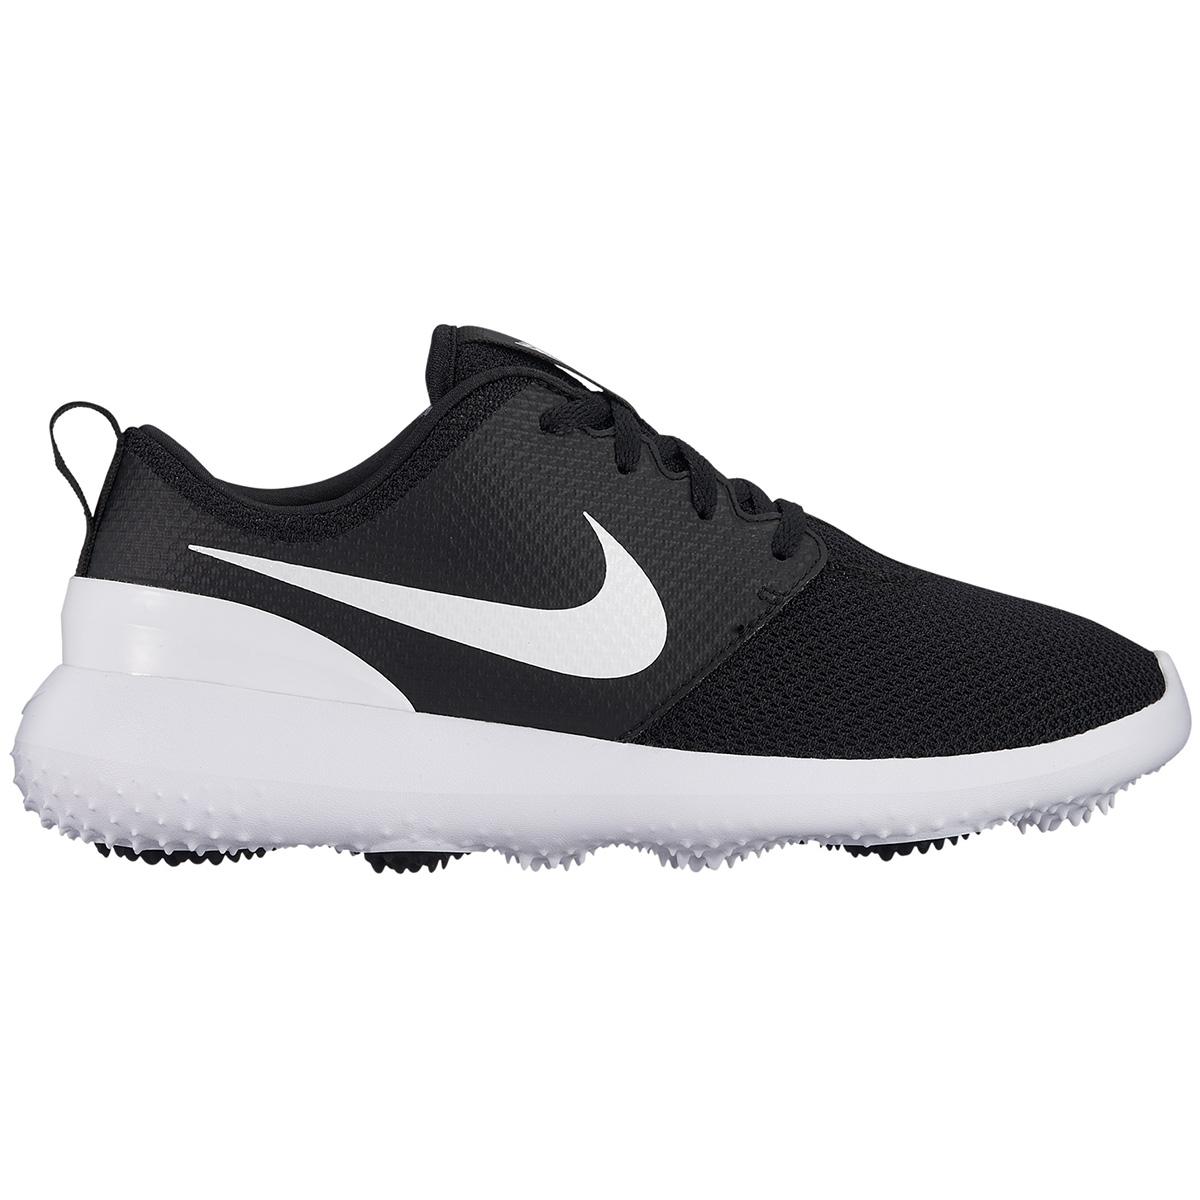 b6cf19162b53 Nike Golf Roshe G Ladies Shoes from american golf